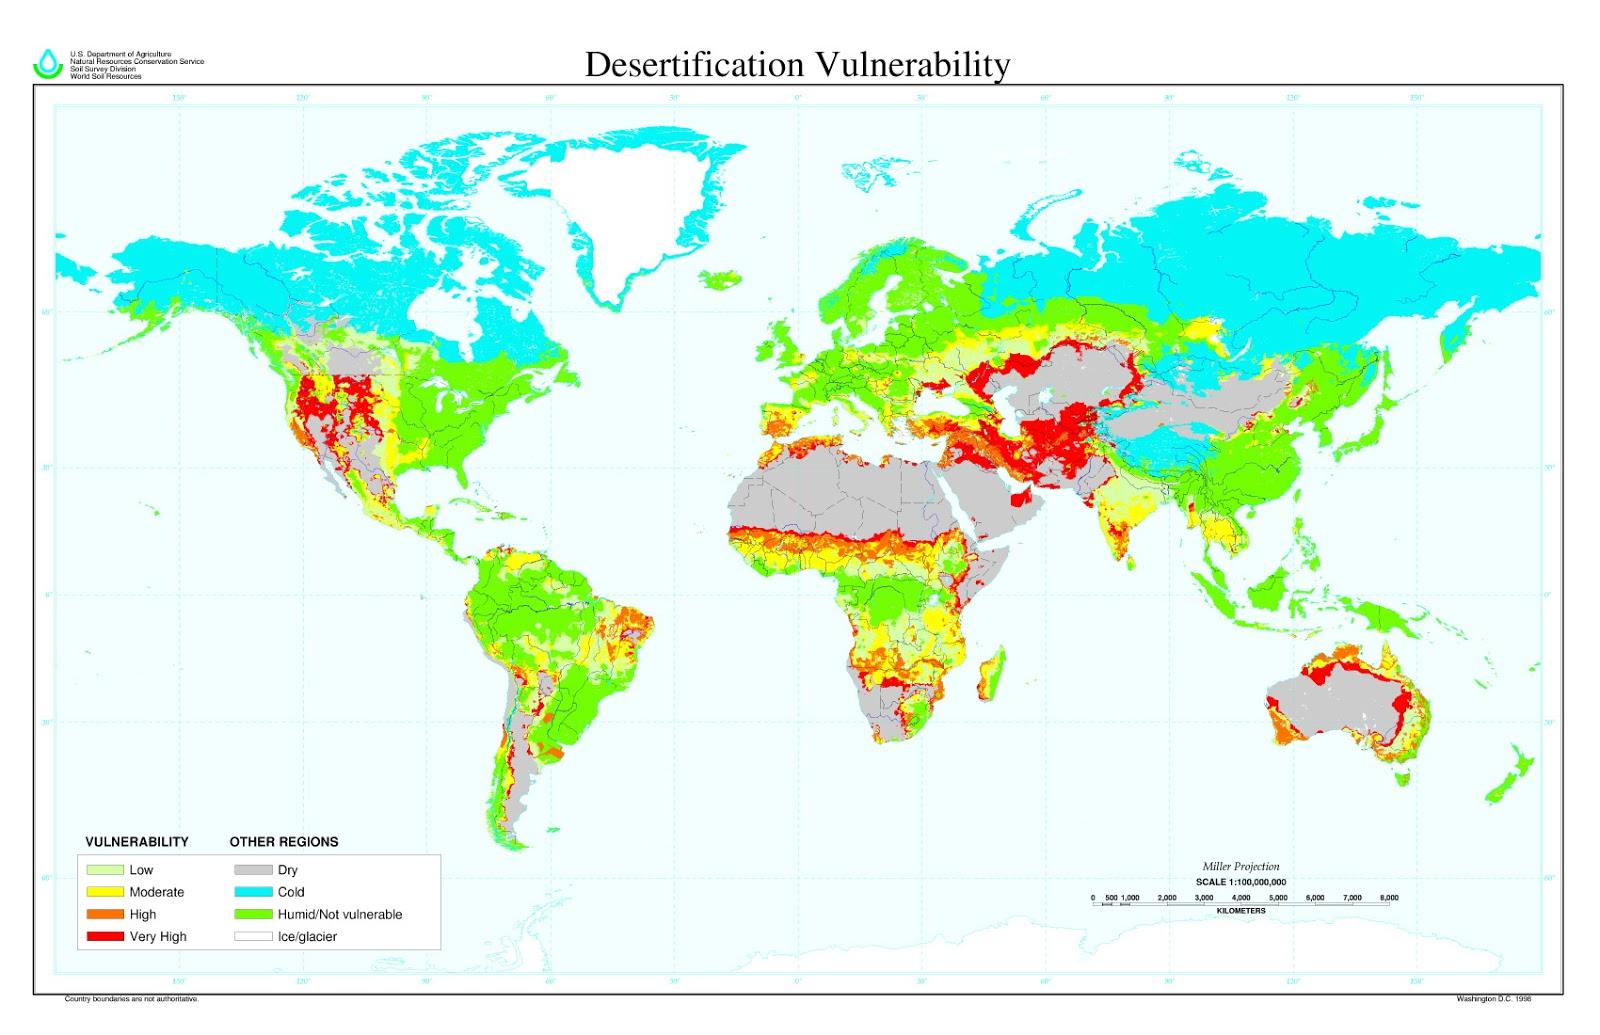 Desertification vulnerability